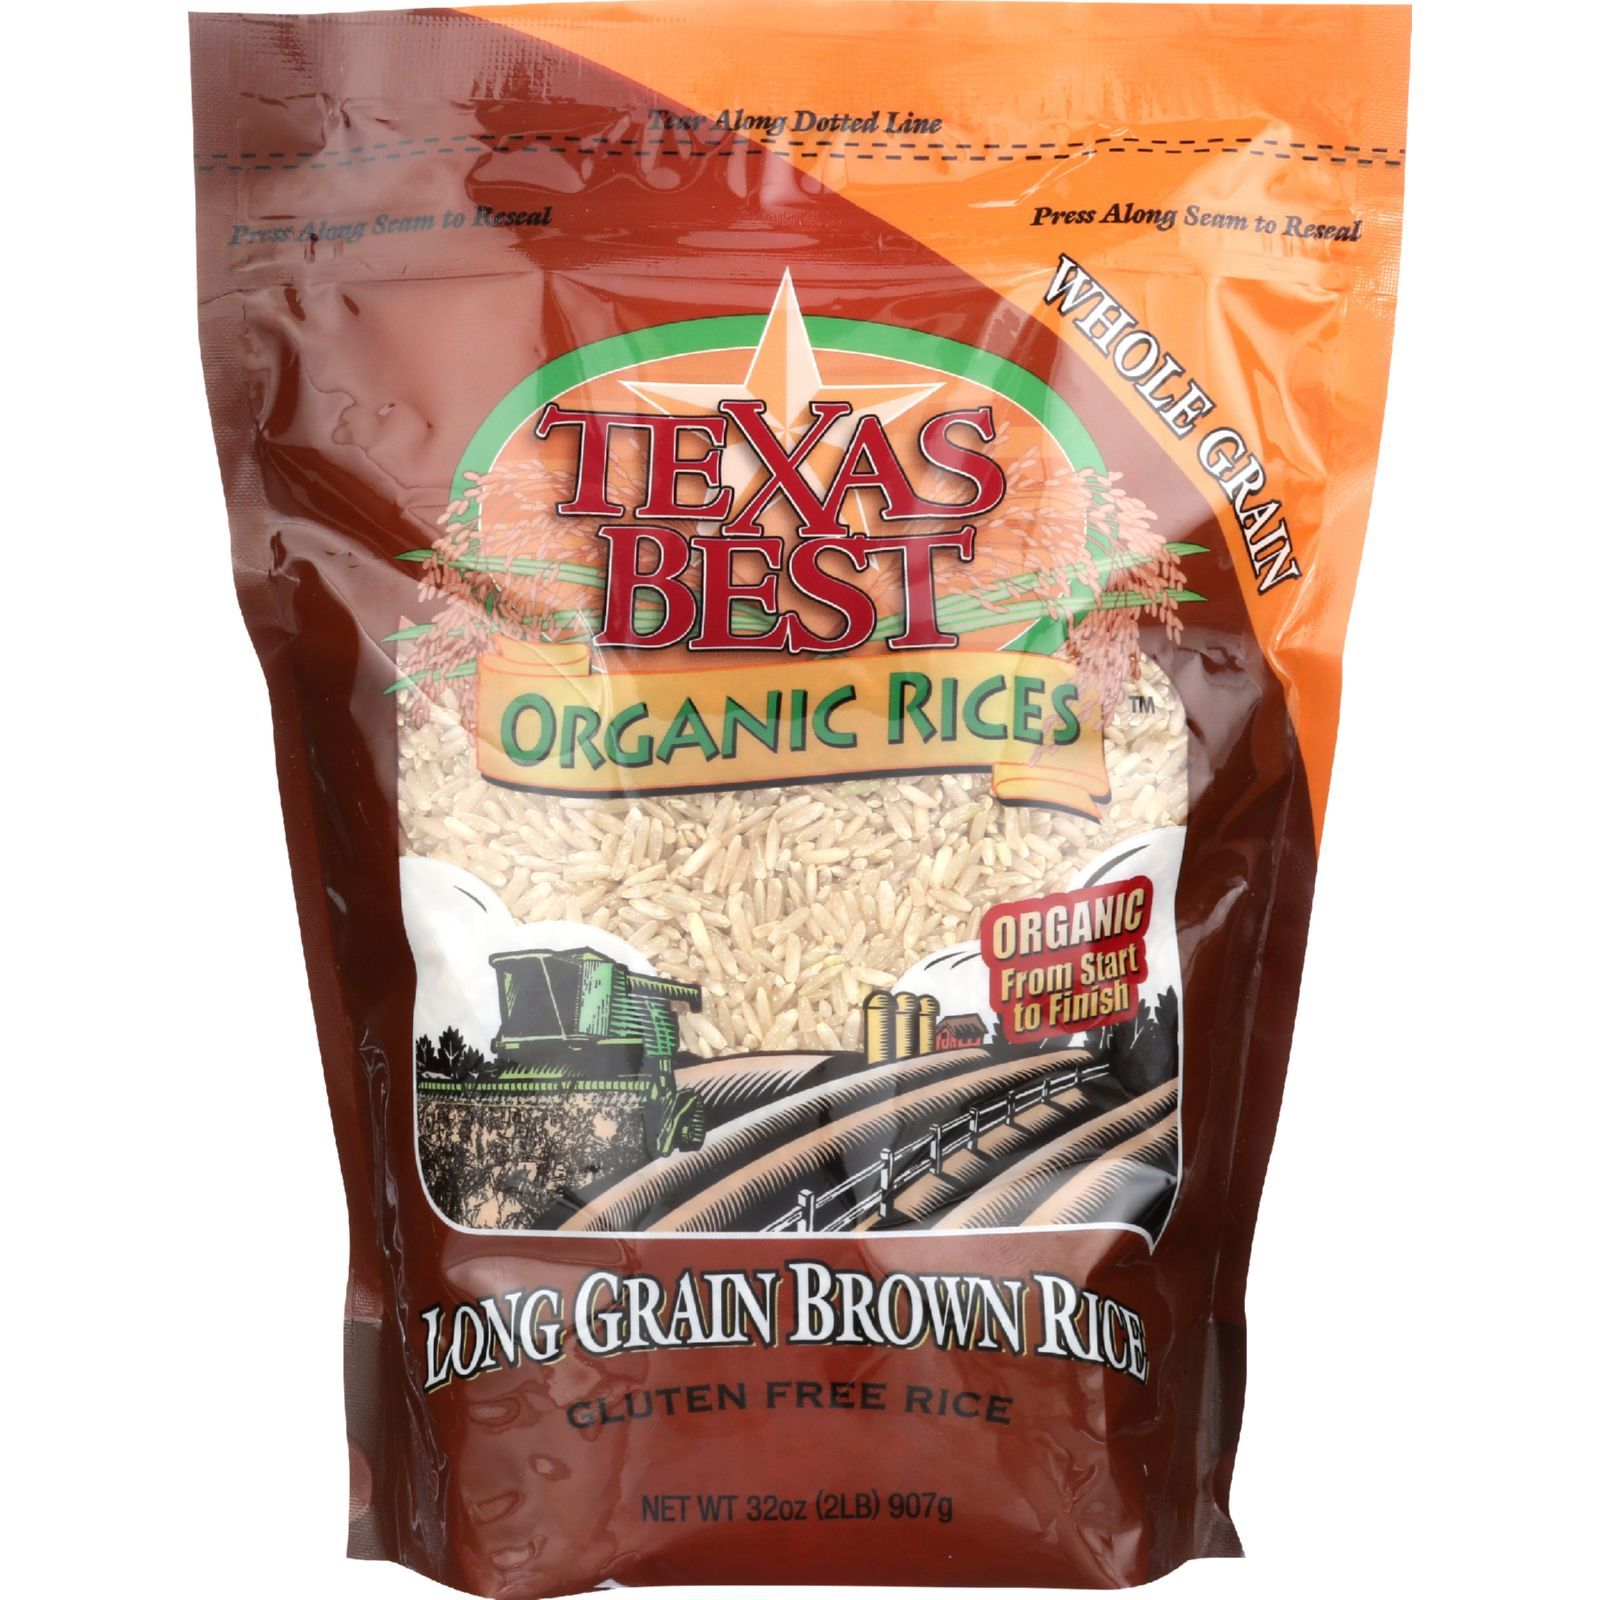 Texas Best Organics Rice - Organic - Long Grain Brown - 32 oz - case of 6